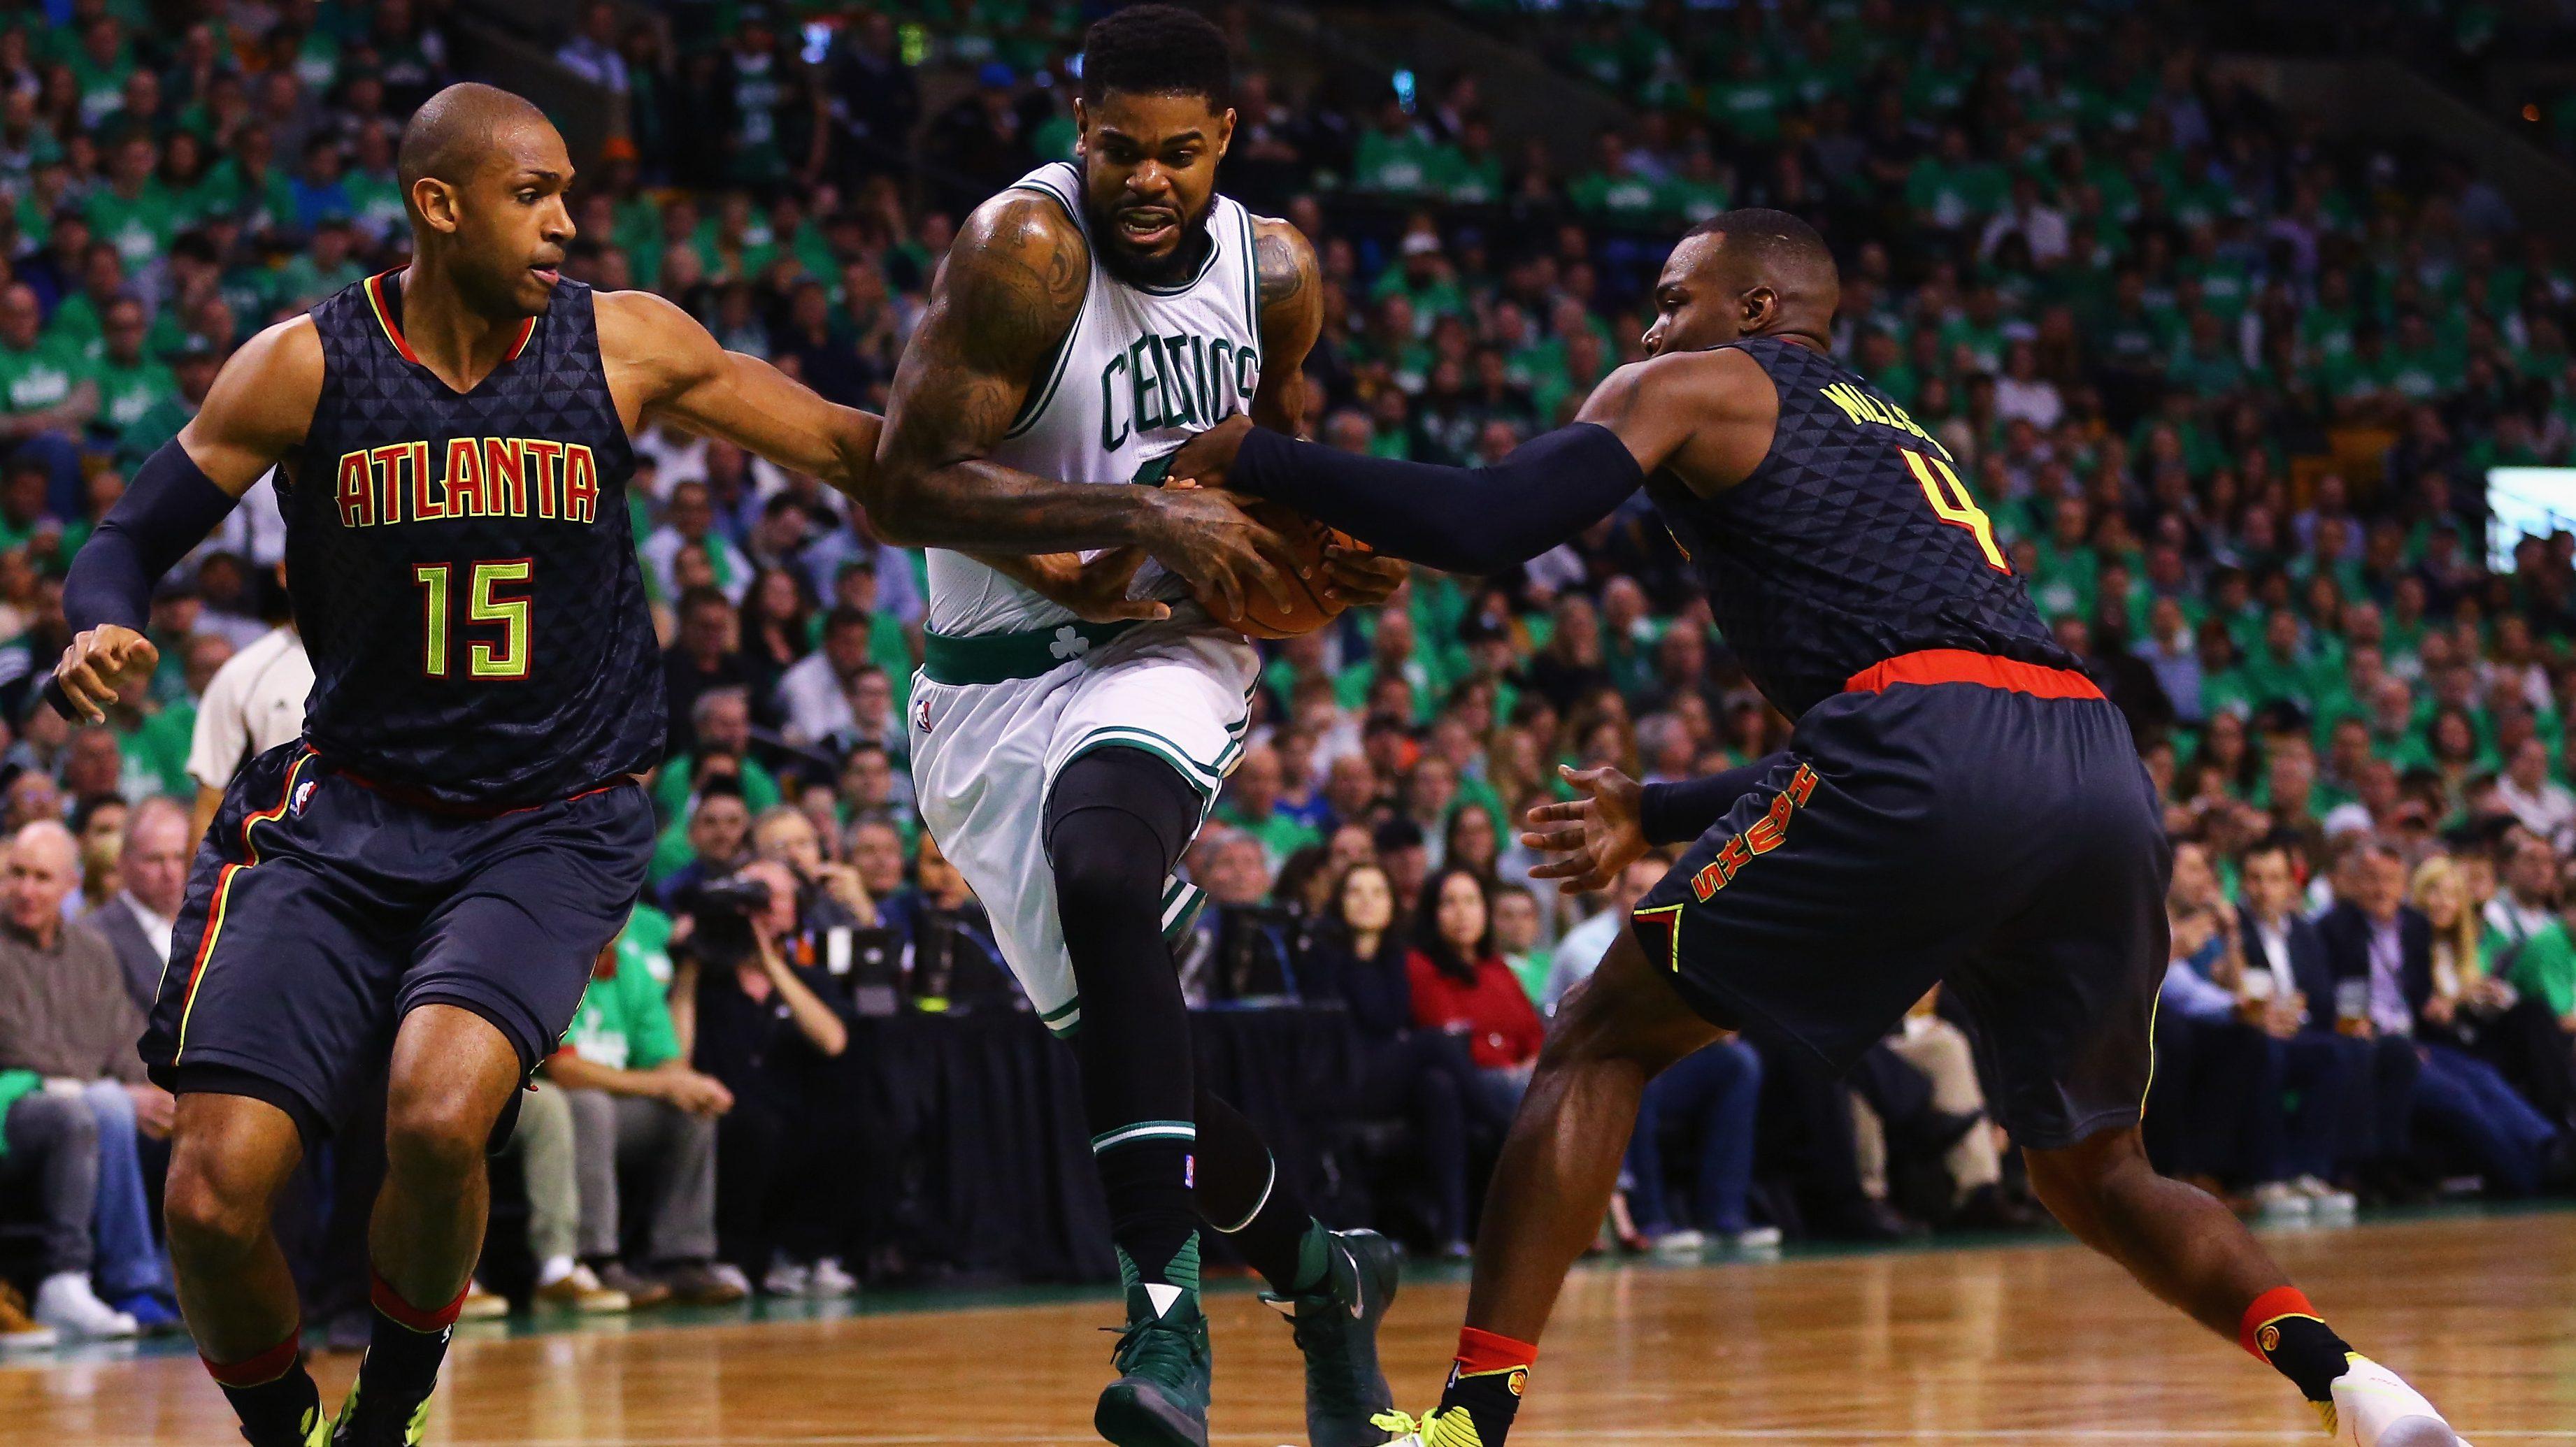 Hawks vs. Celtics Live Stream: How to Watch Game 4 for Free   Heavy.com